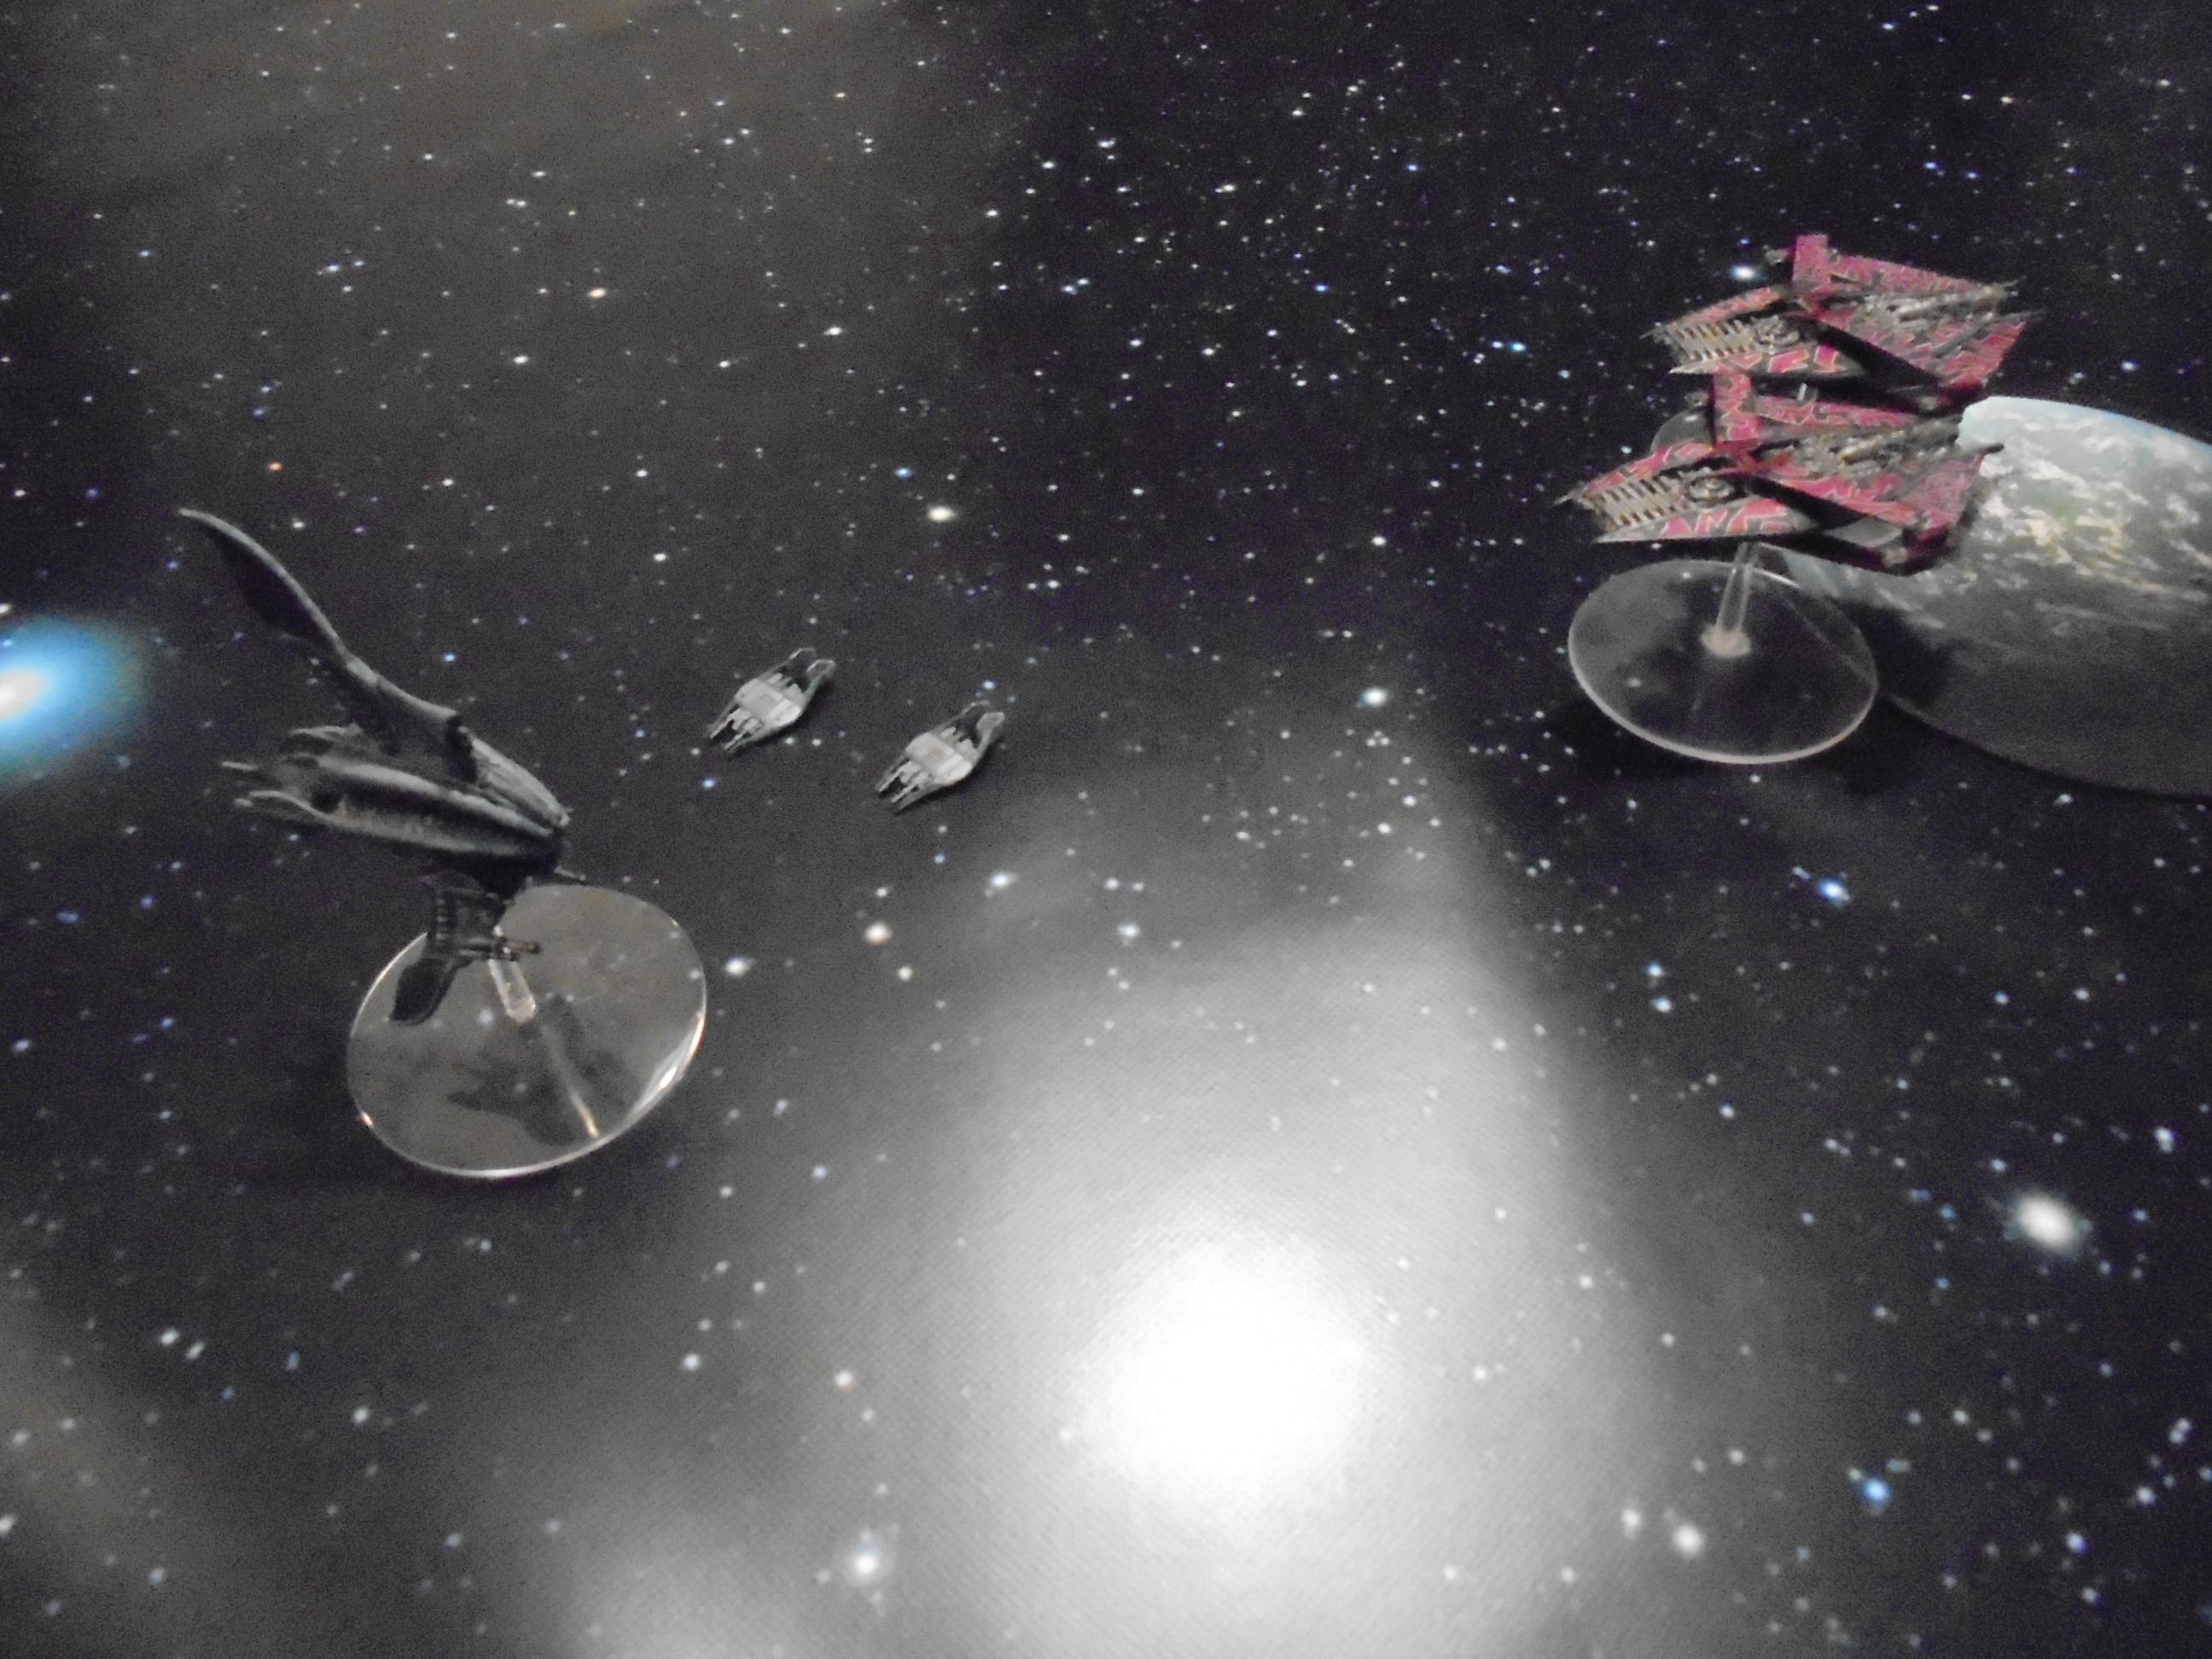 Acta., Babylon 5, game 3, turn 7